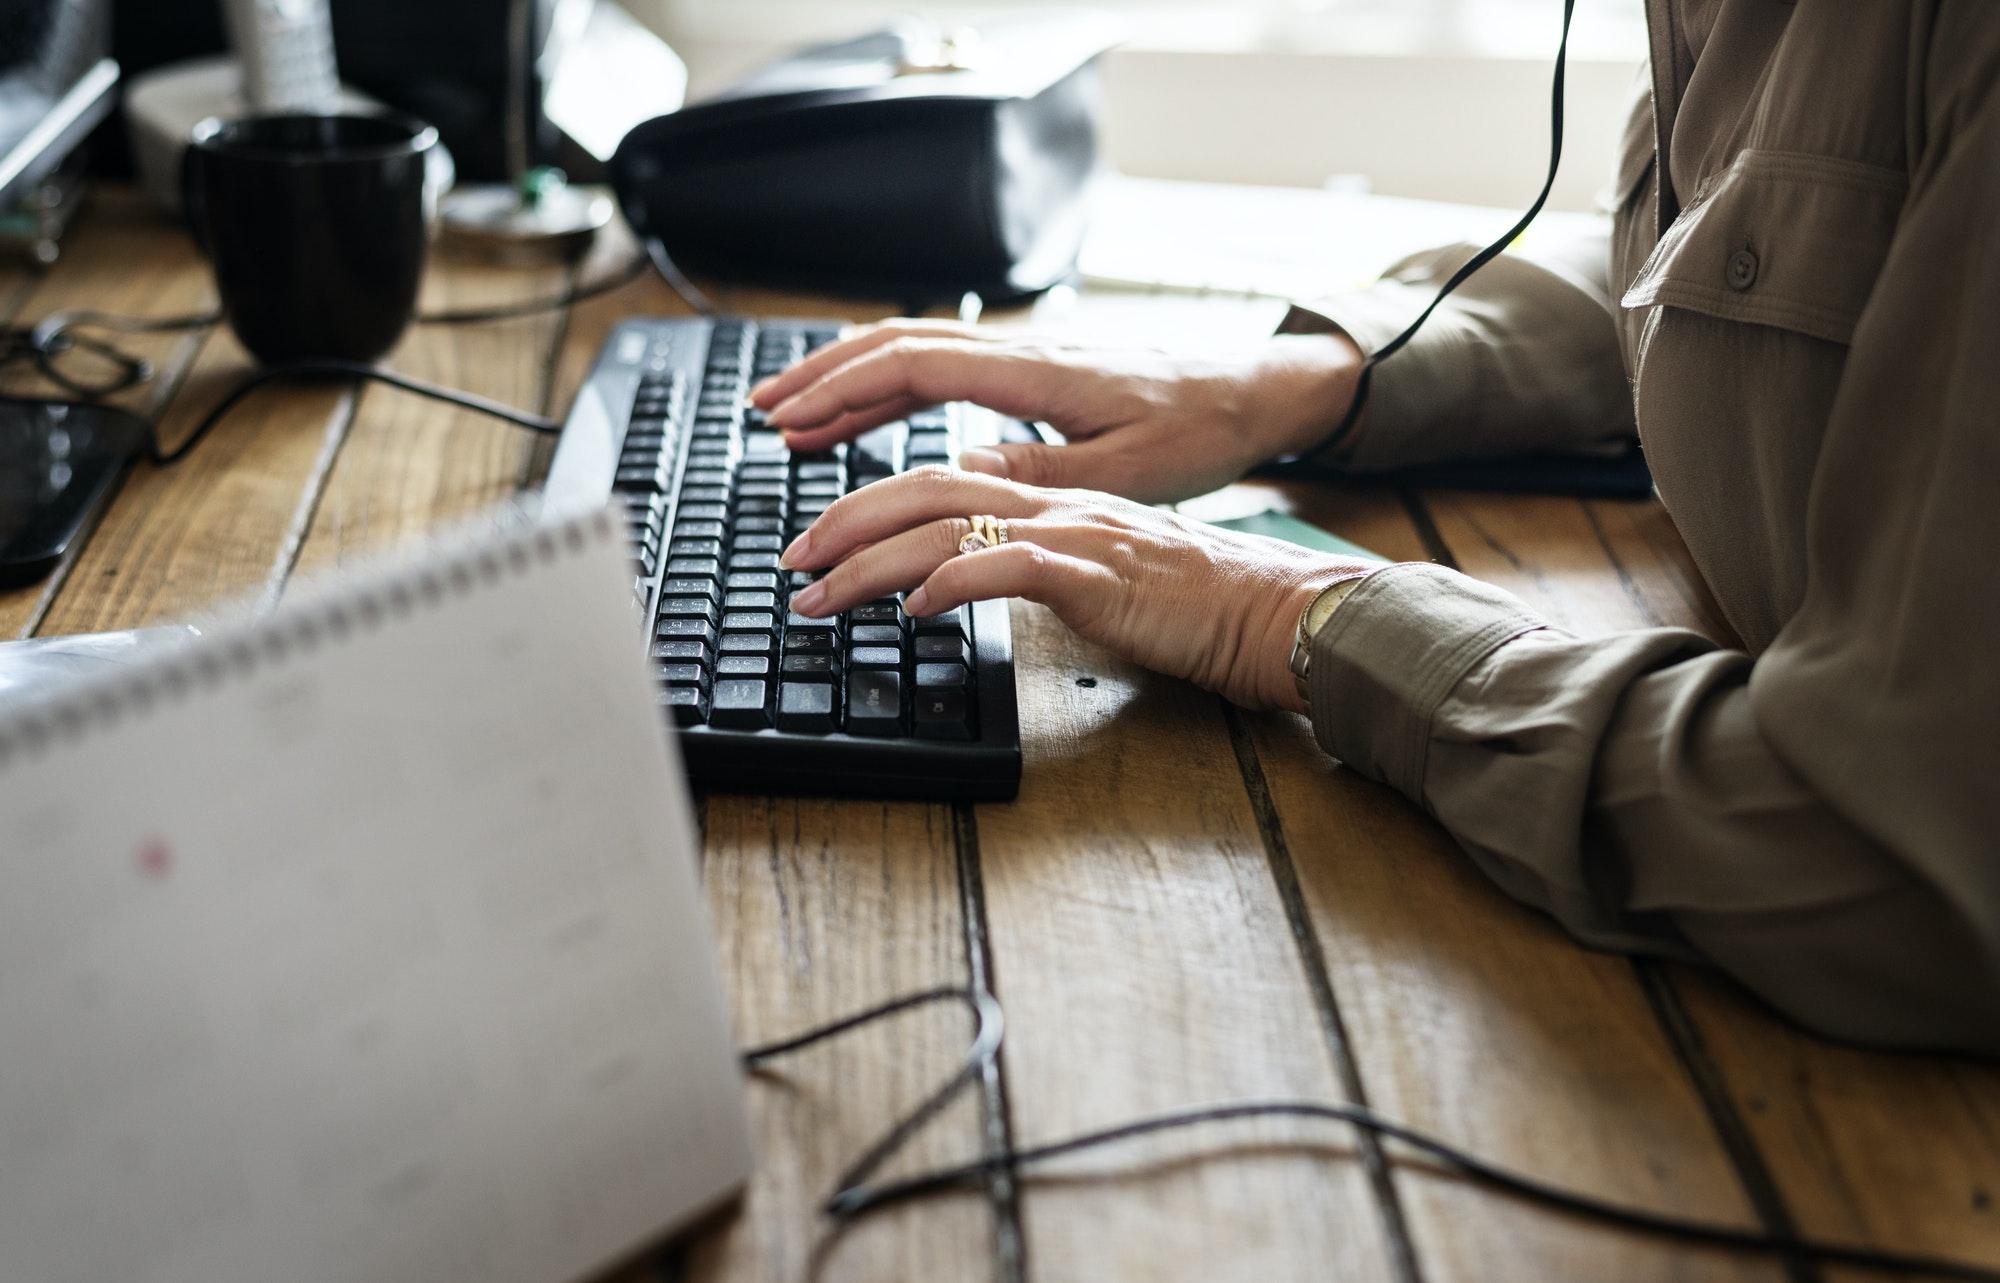 Caucasian woman using computer